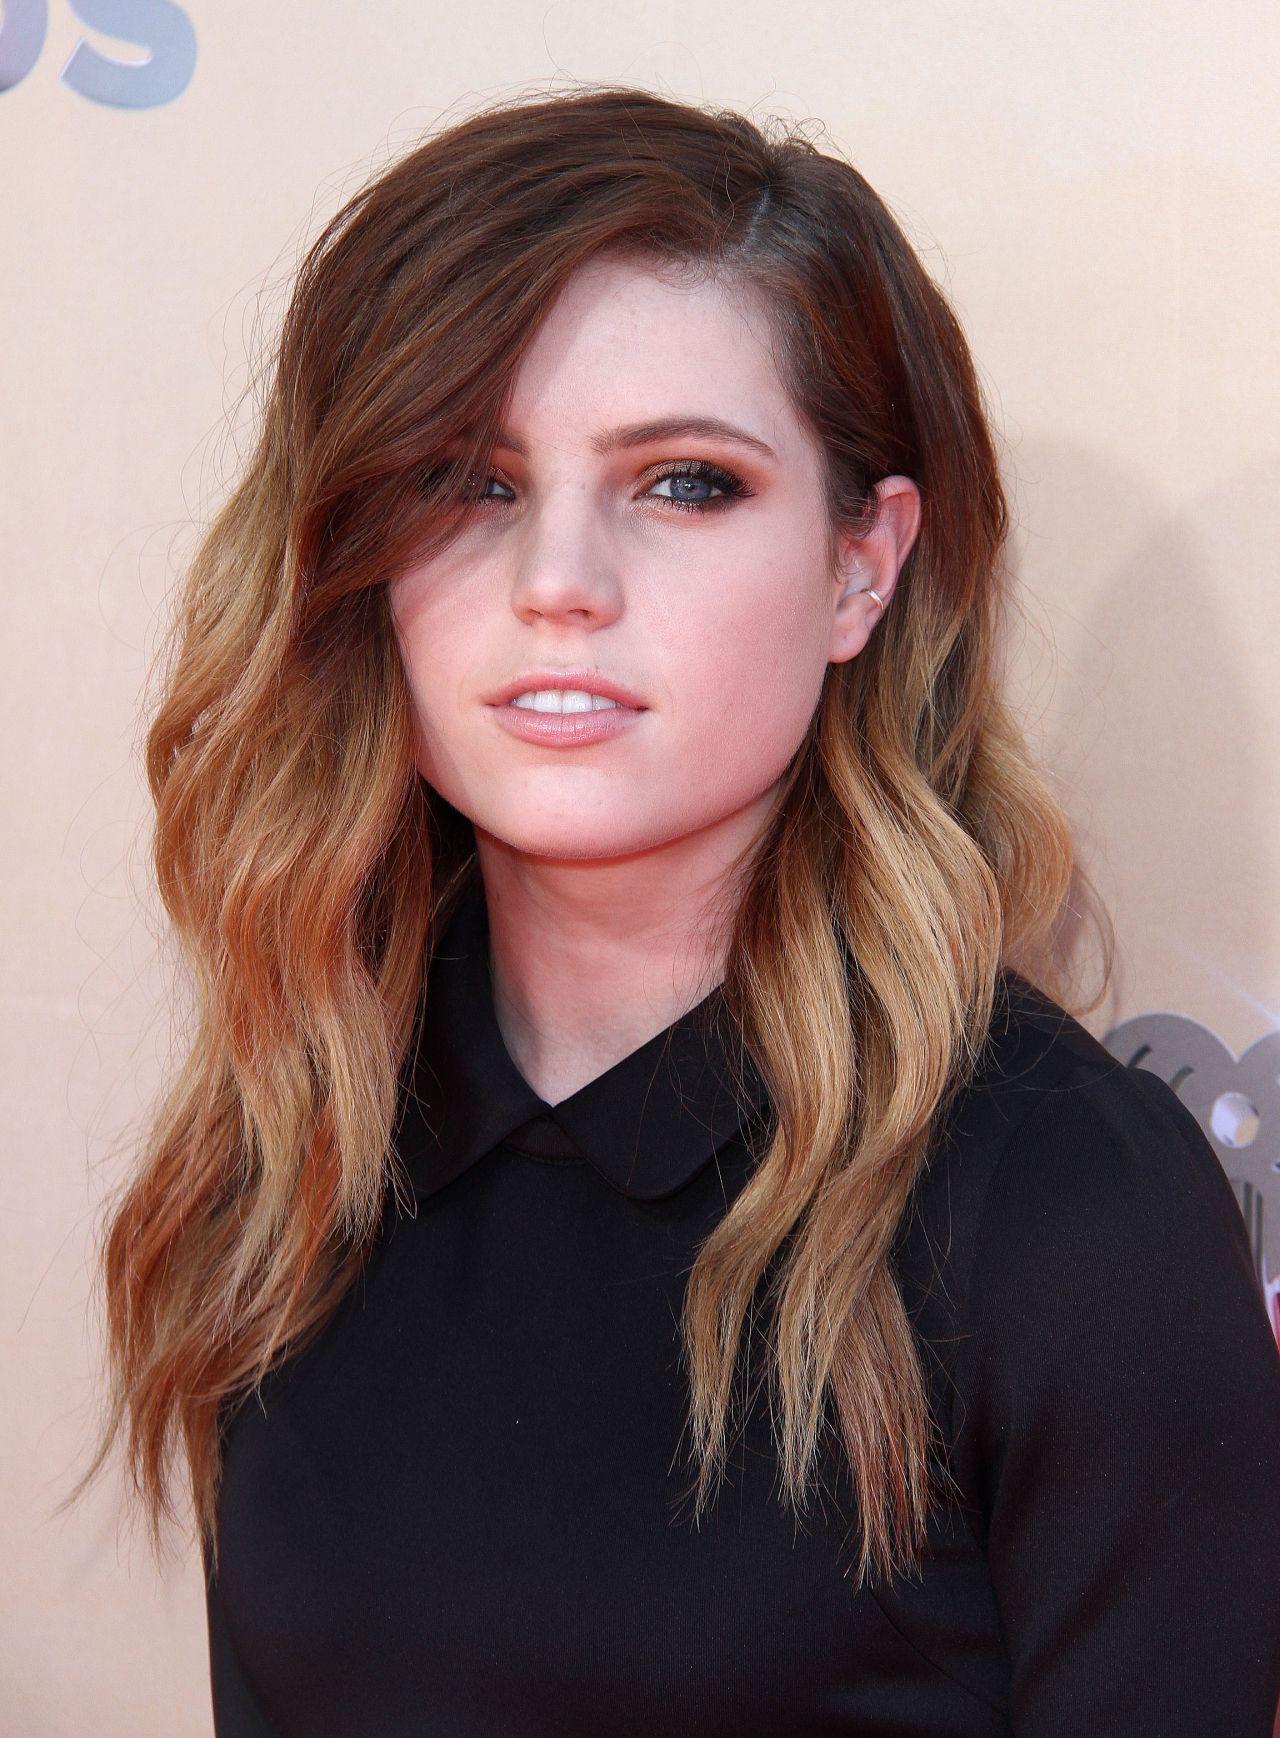 Top 20 Celebrity Under 20 Hot List